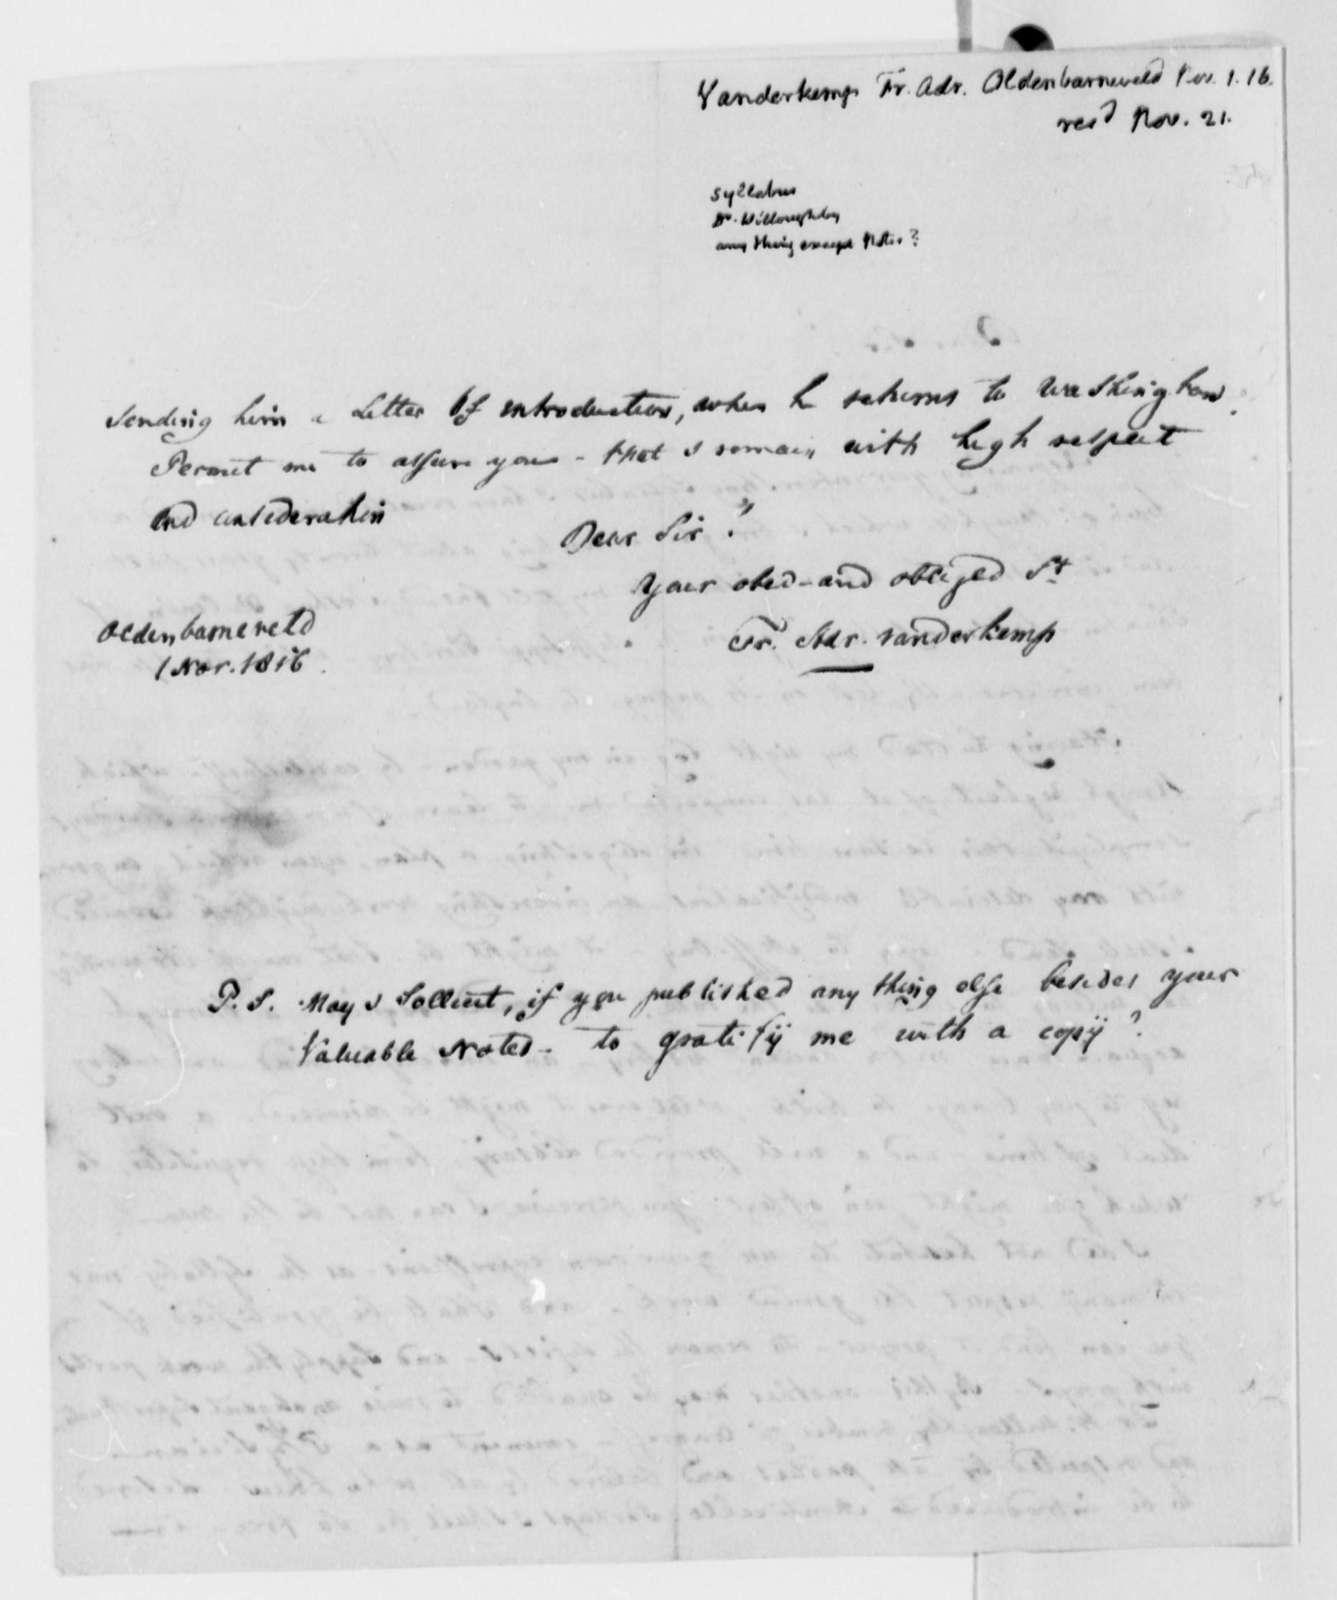 Francis A. van der Kemp to Thomas Jefferson, November 1, 1816